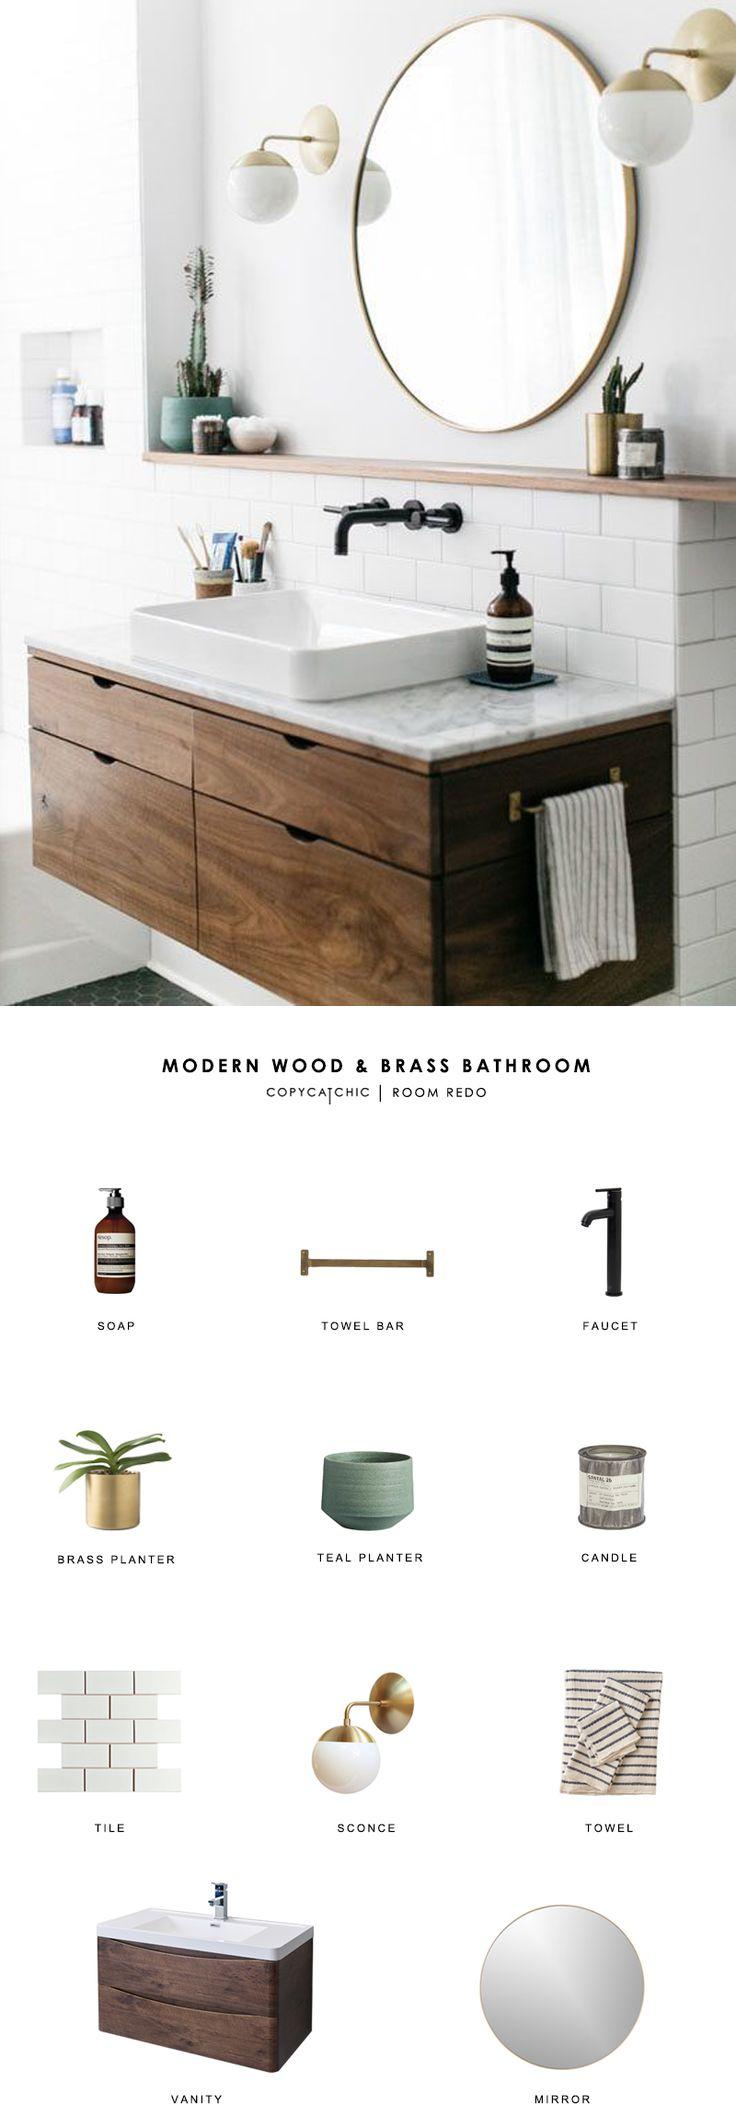 Copy Cat Chic Room Redo | Modern Wood and Brass Bathroom | Copy Cat Chic | Bloglovin'